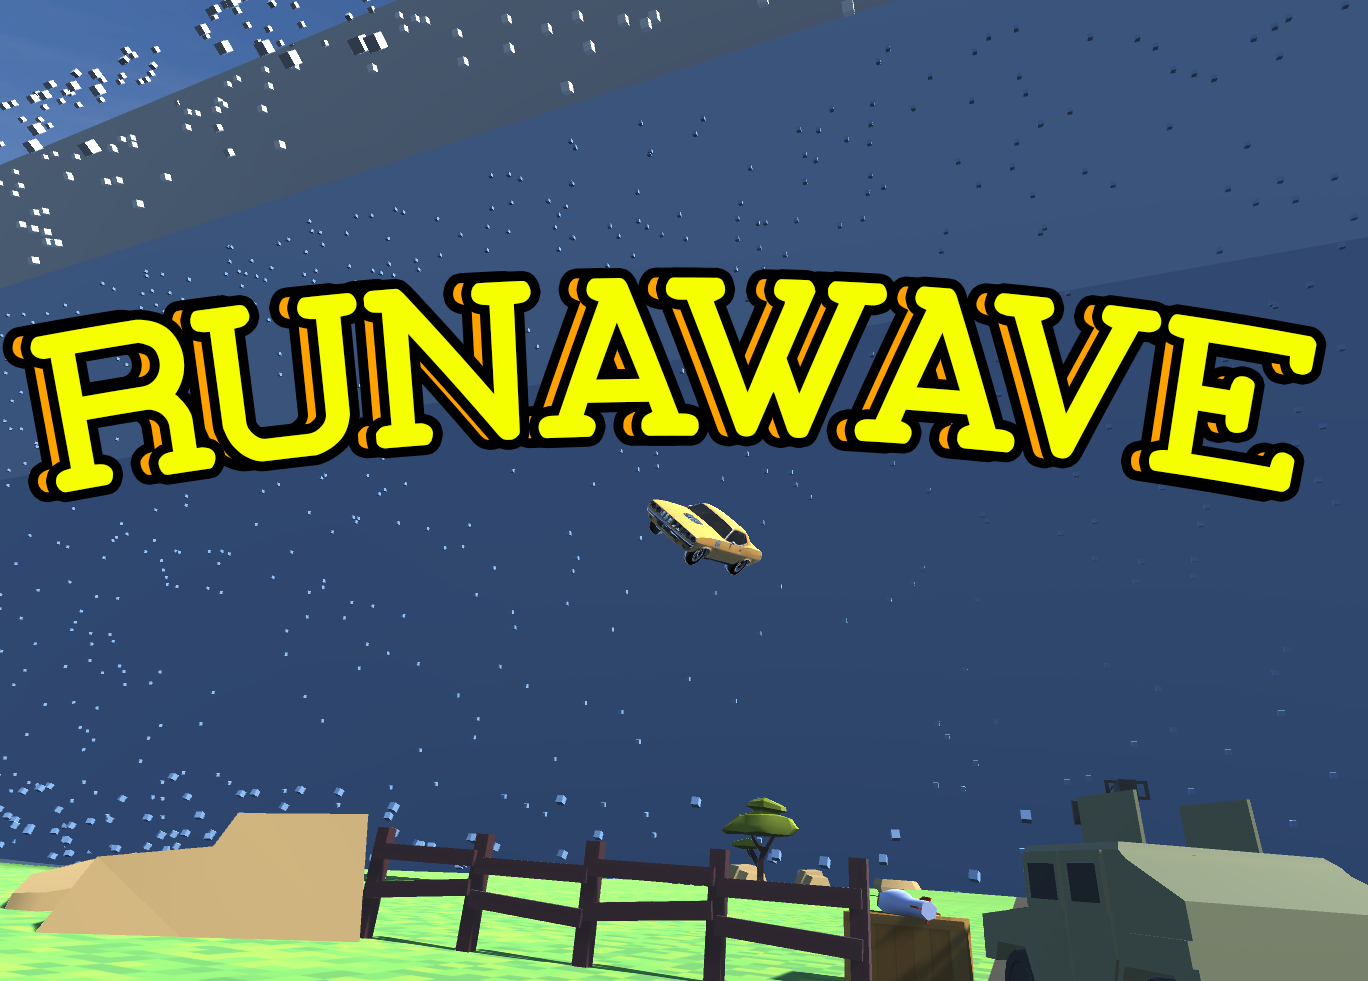 Runawave